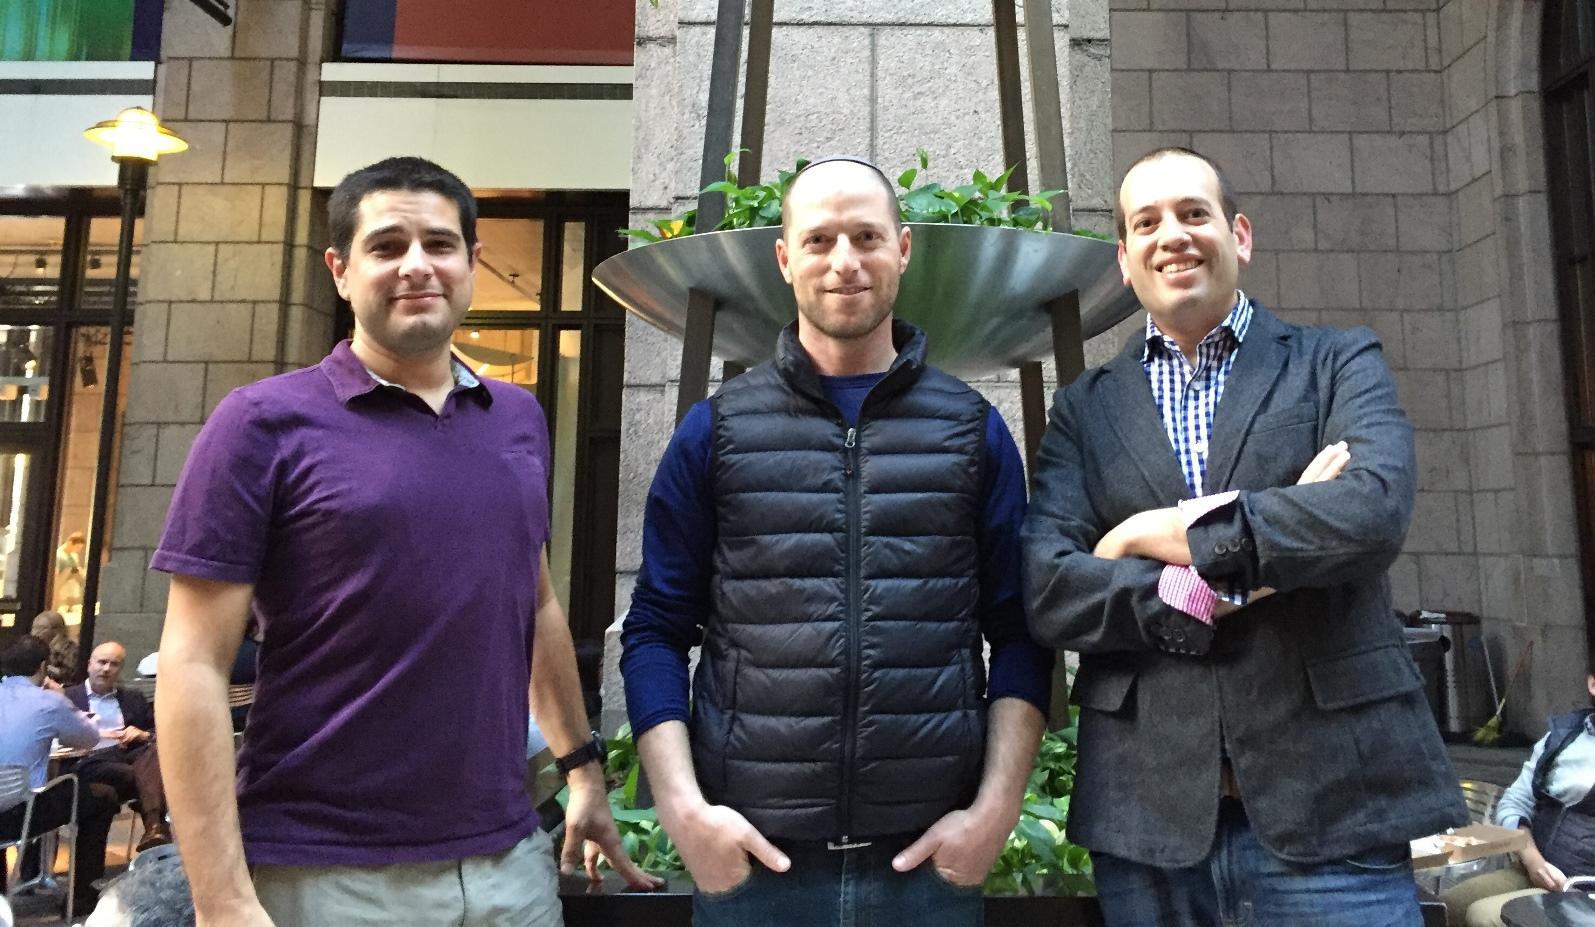 Jifiti cofounders, from left, CTO Meir Dudai, CEO Yaacov Martin and CMO Shaul Weisband. Photo: courtesy